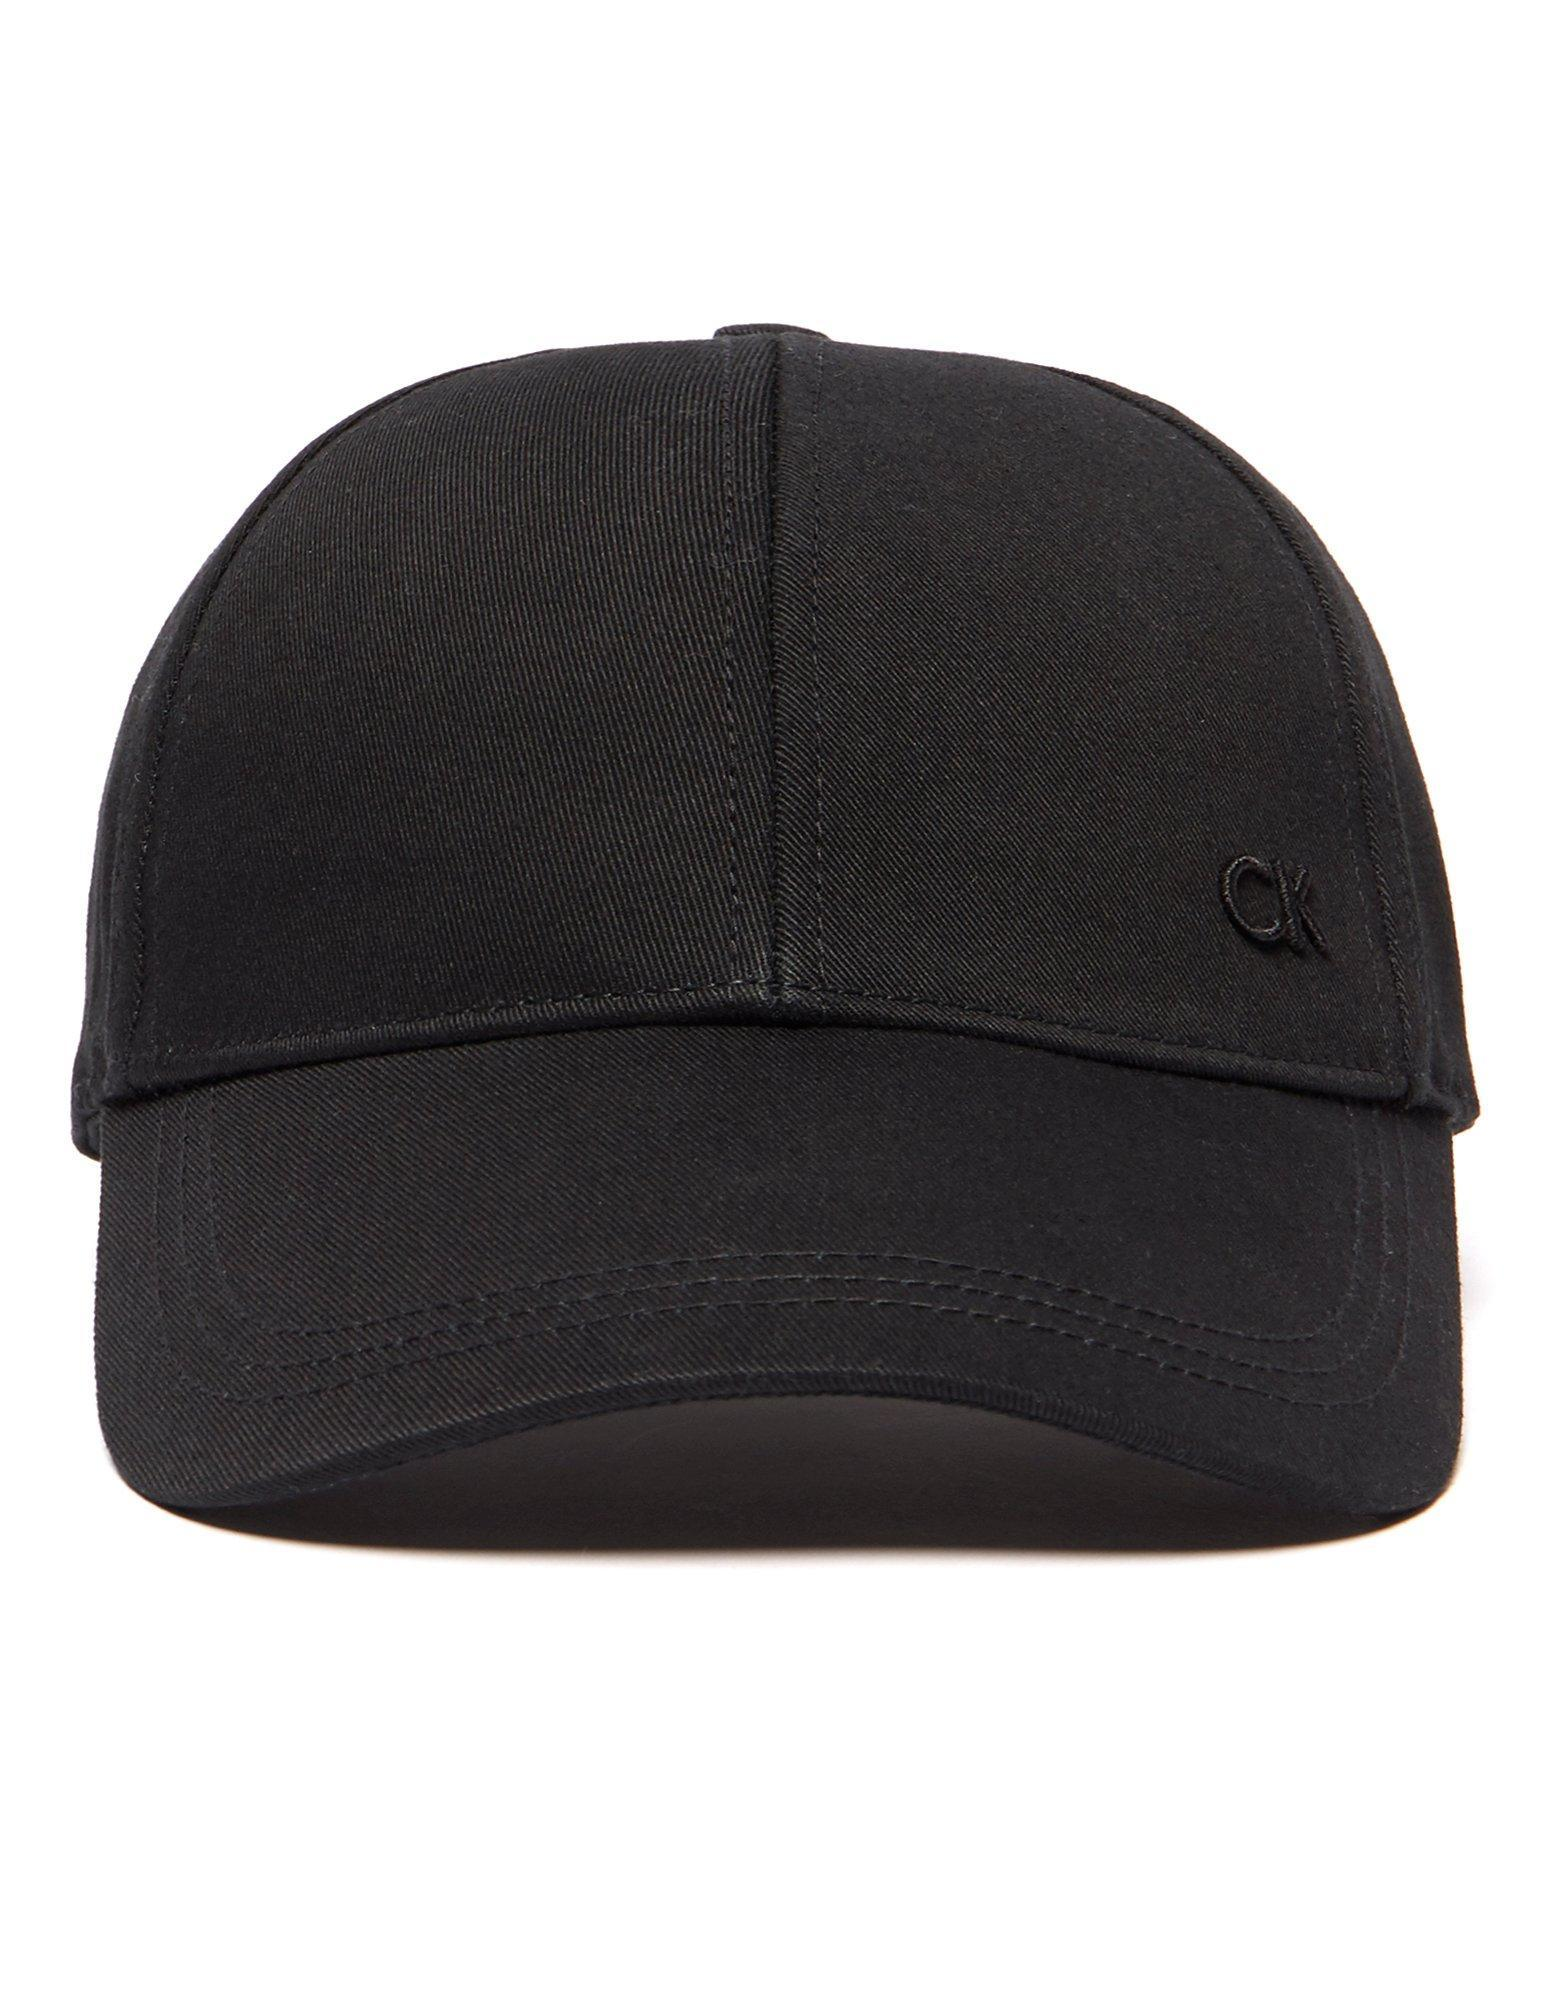 calvin klein baseball cap in black for men lyst. Black Bedroom Furniture Sets. Home Design Ideas